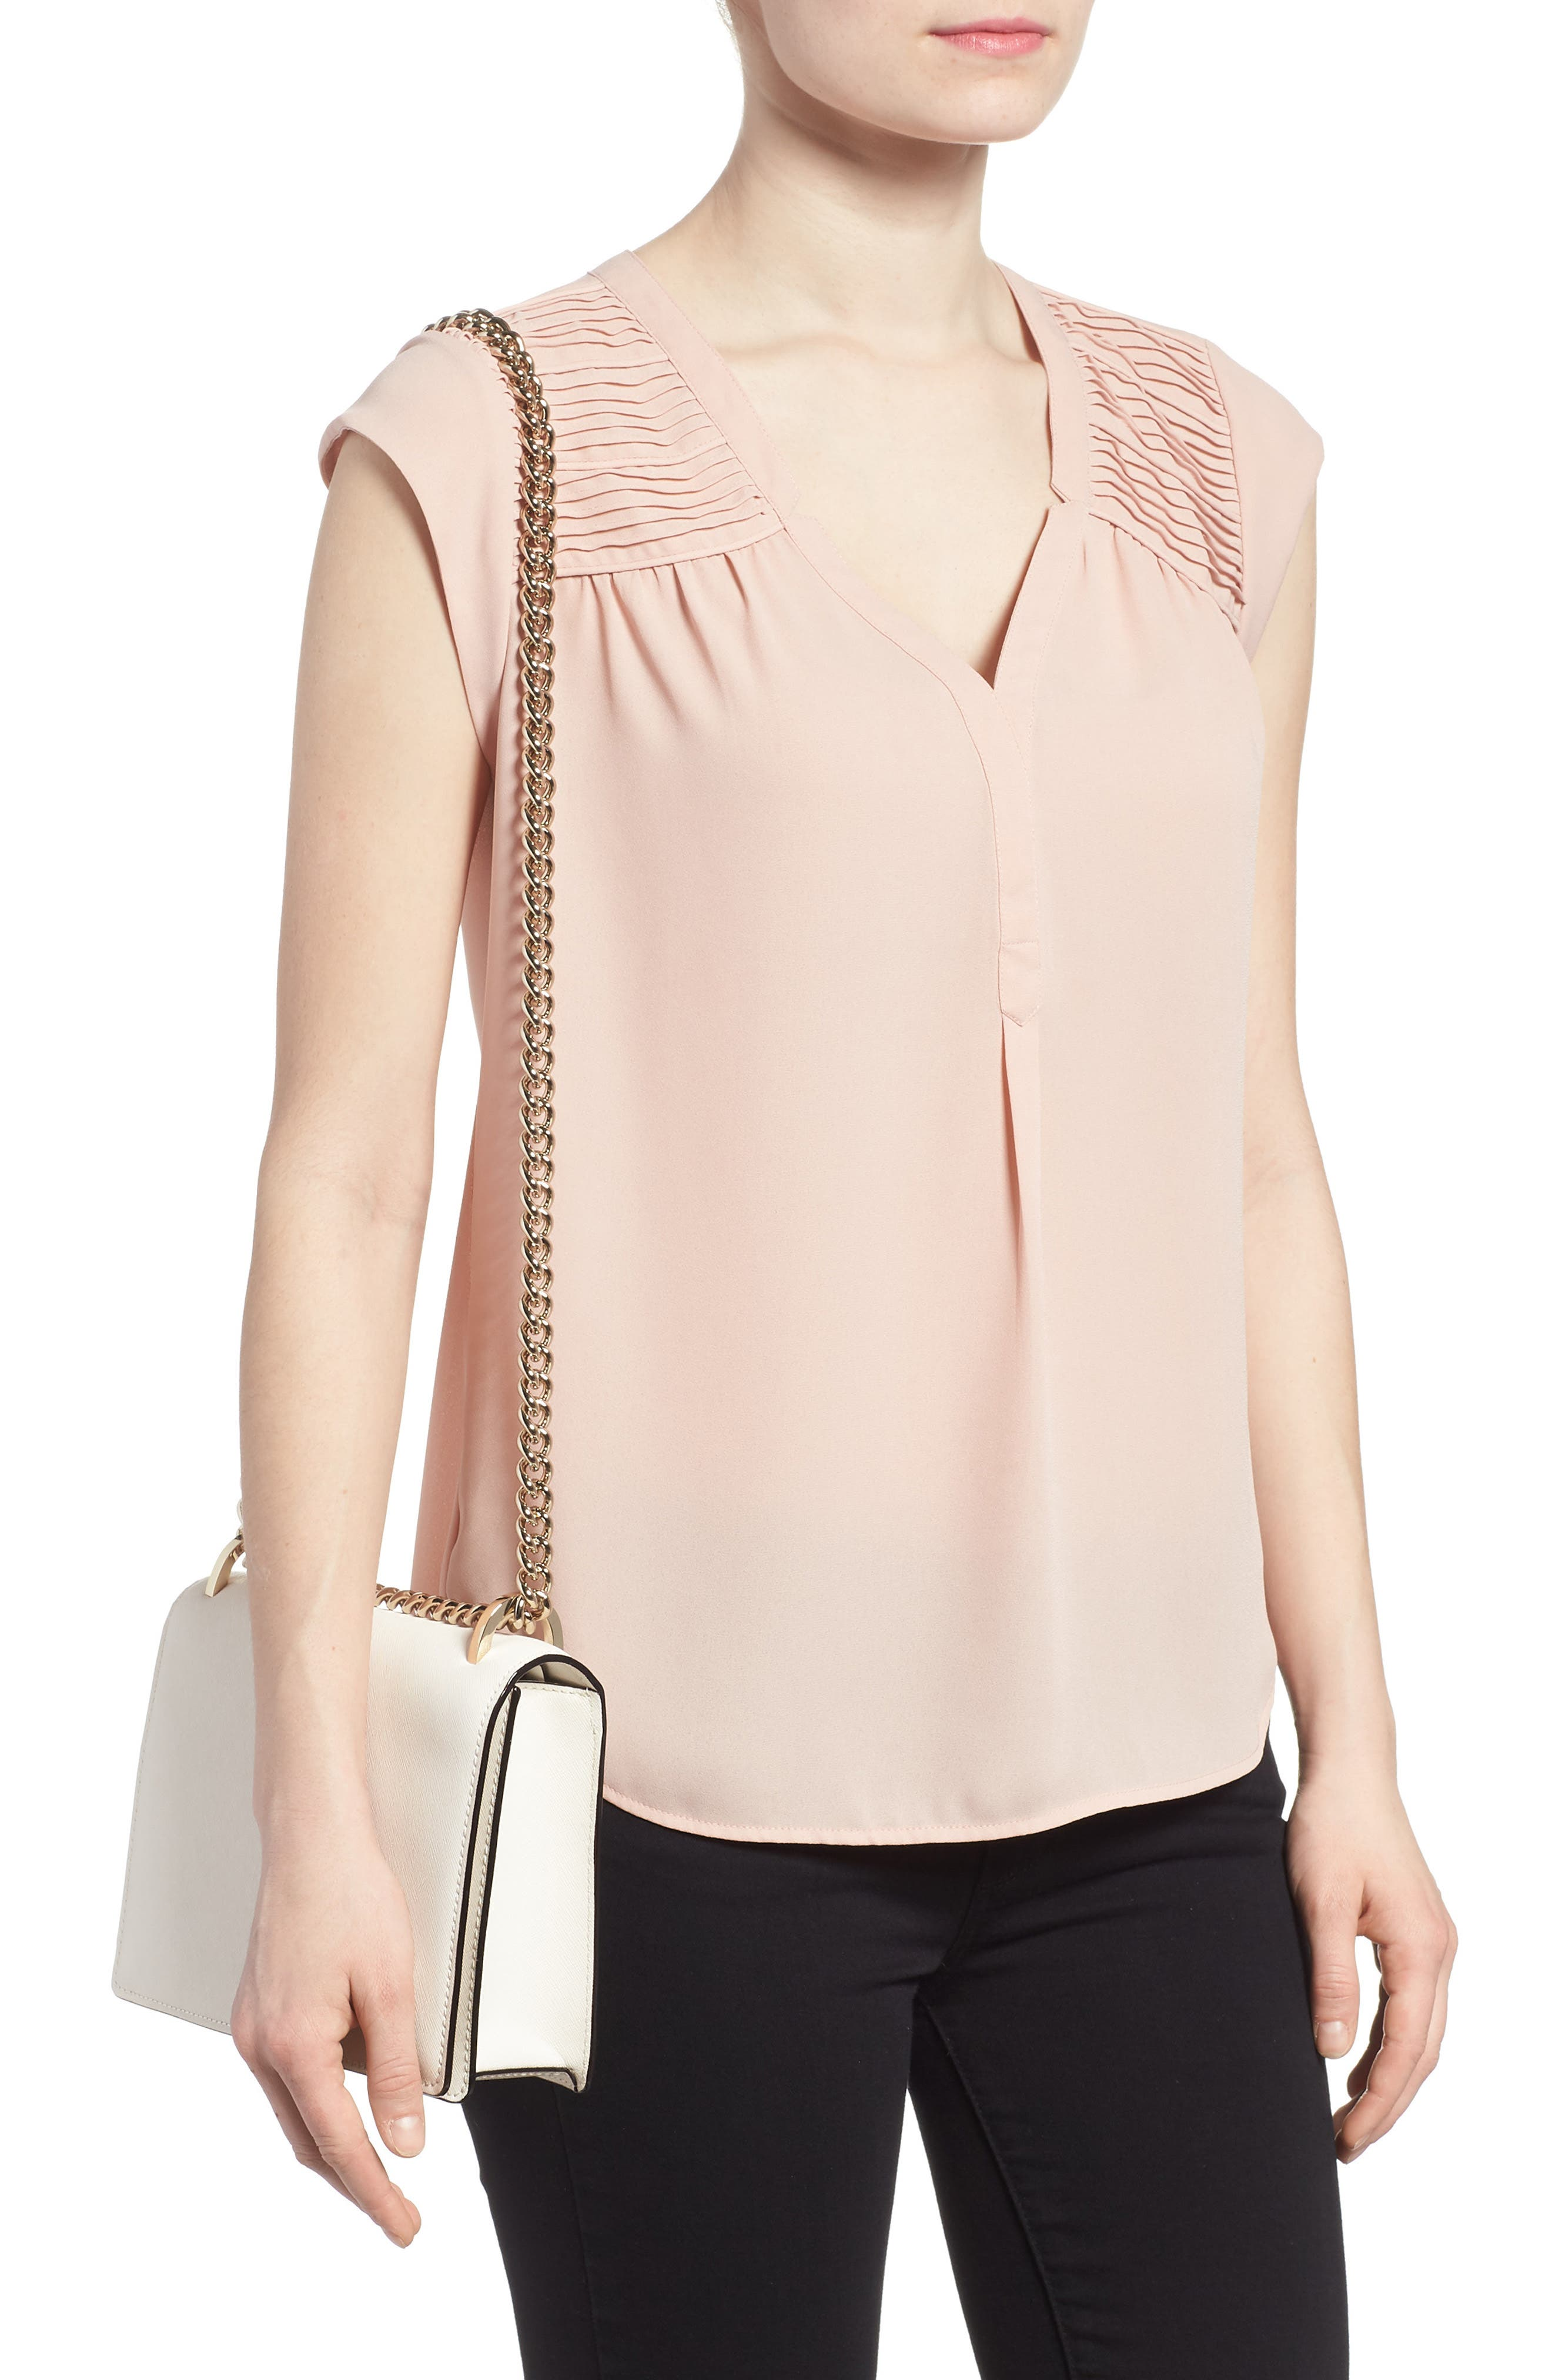 cameron street marci leather shoulder bag,                             Alternate thumbnail 2, color,                             Cement